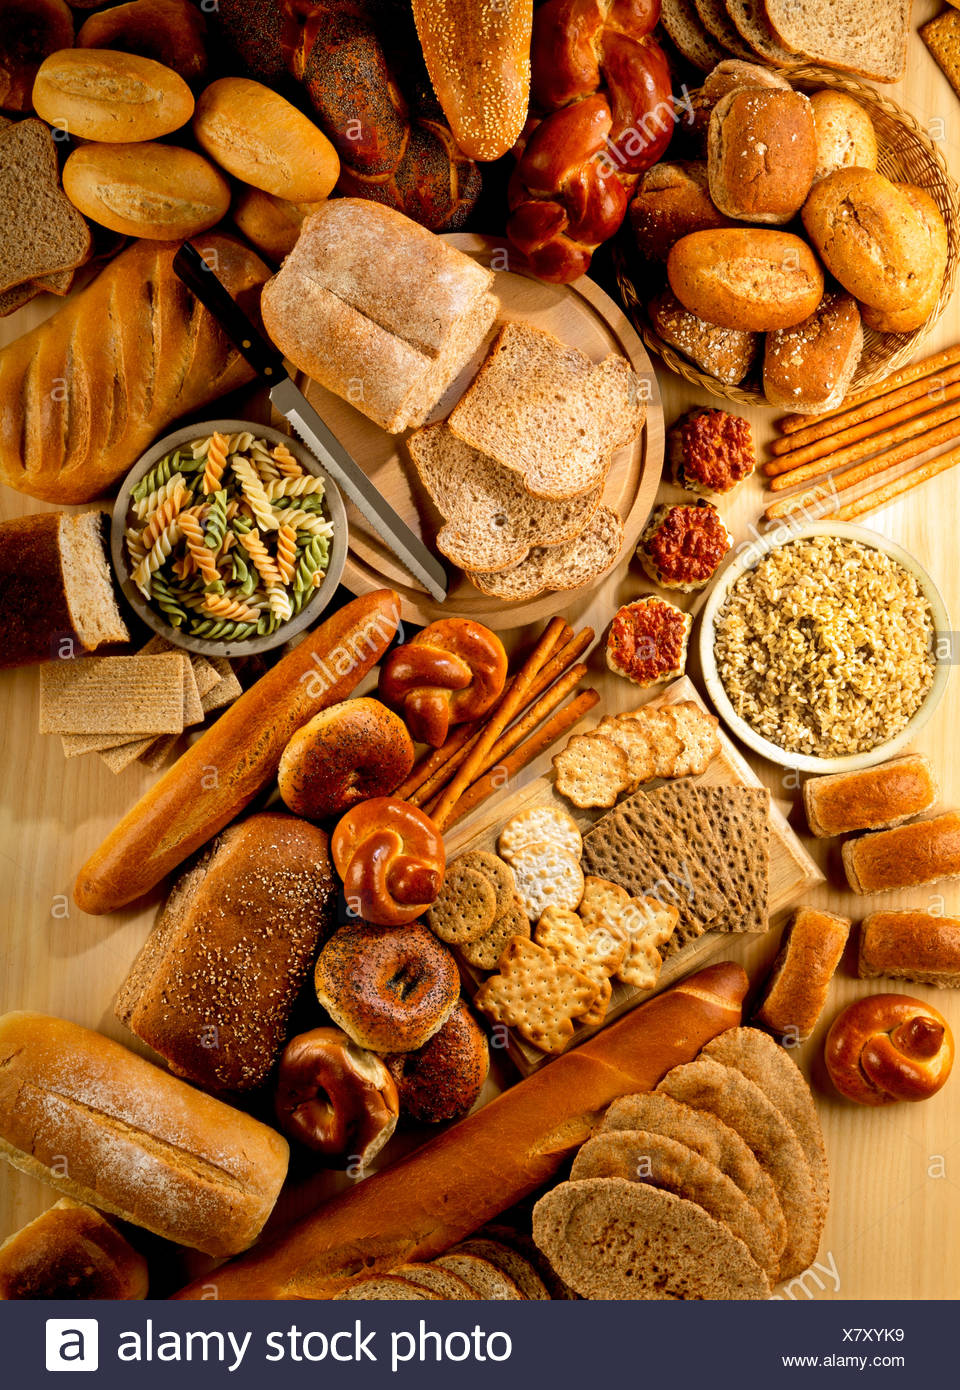 WHEAT FOODS - Stock Image